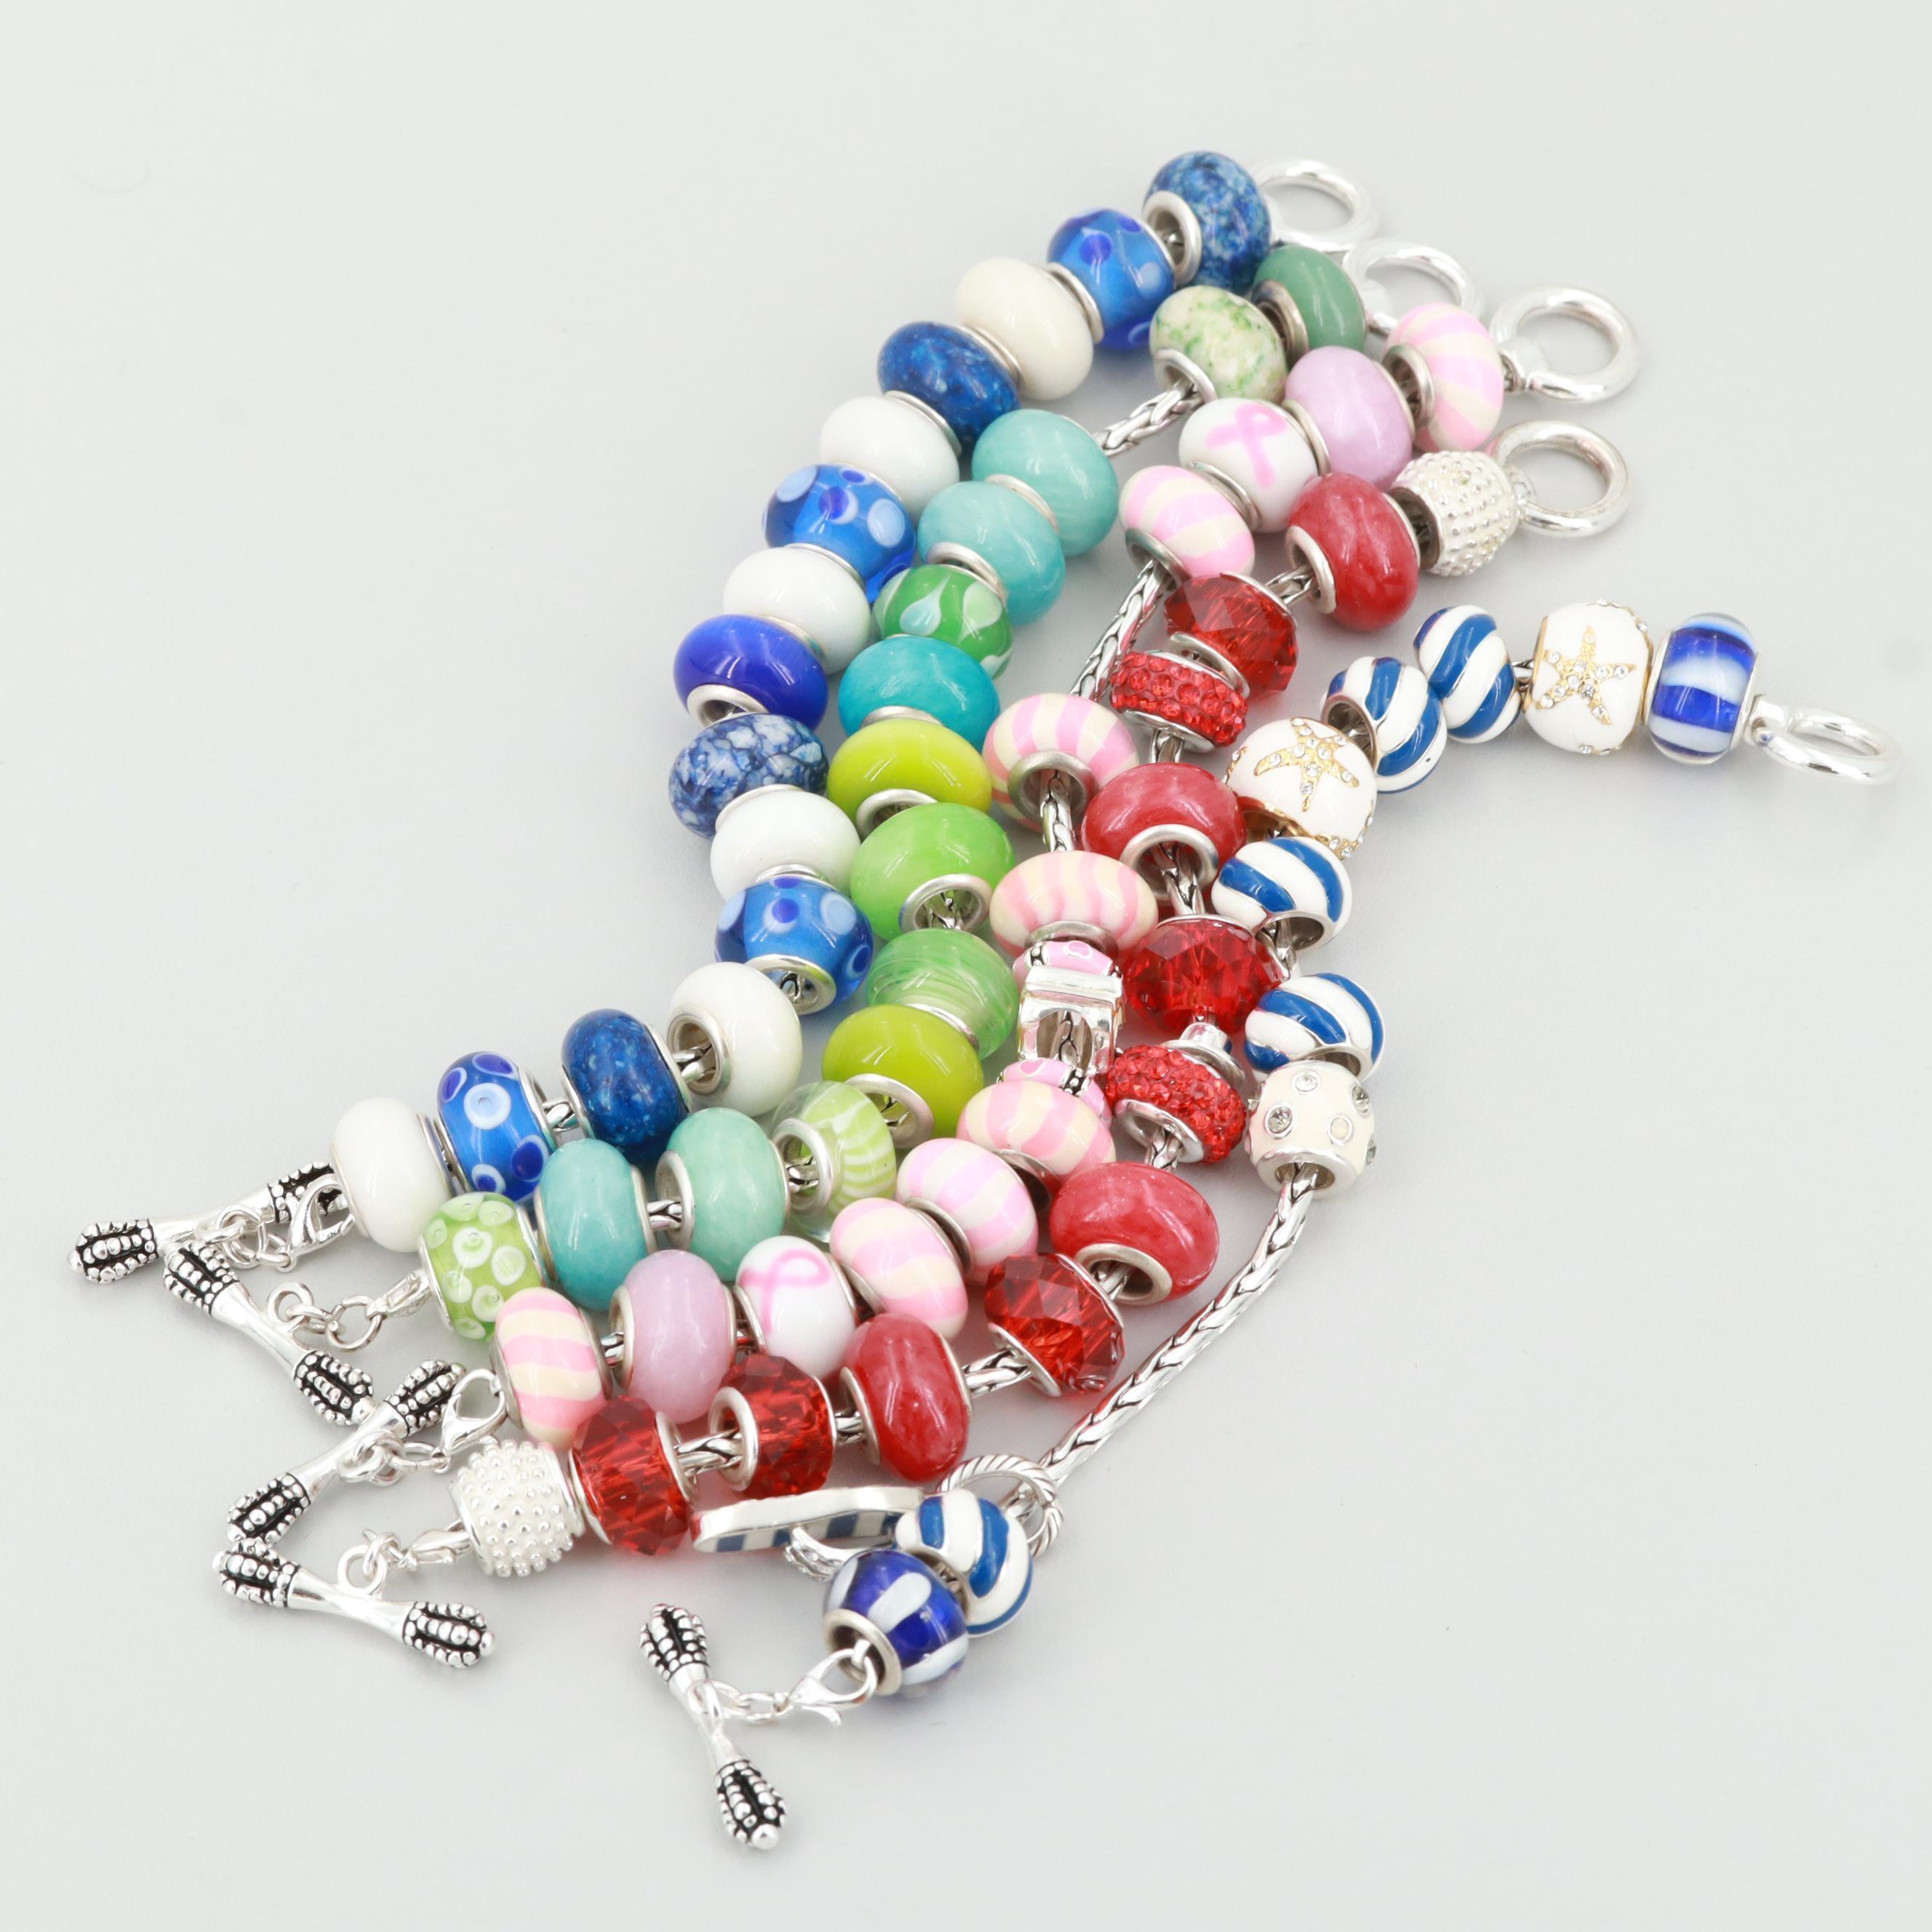 Silver Tone Glass Bead Charm Bracelets